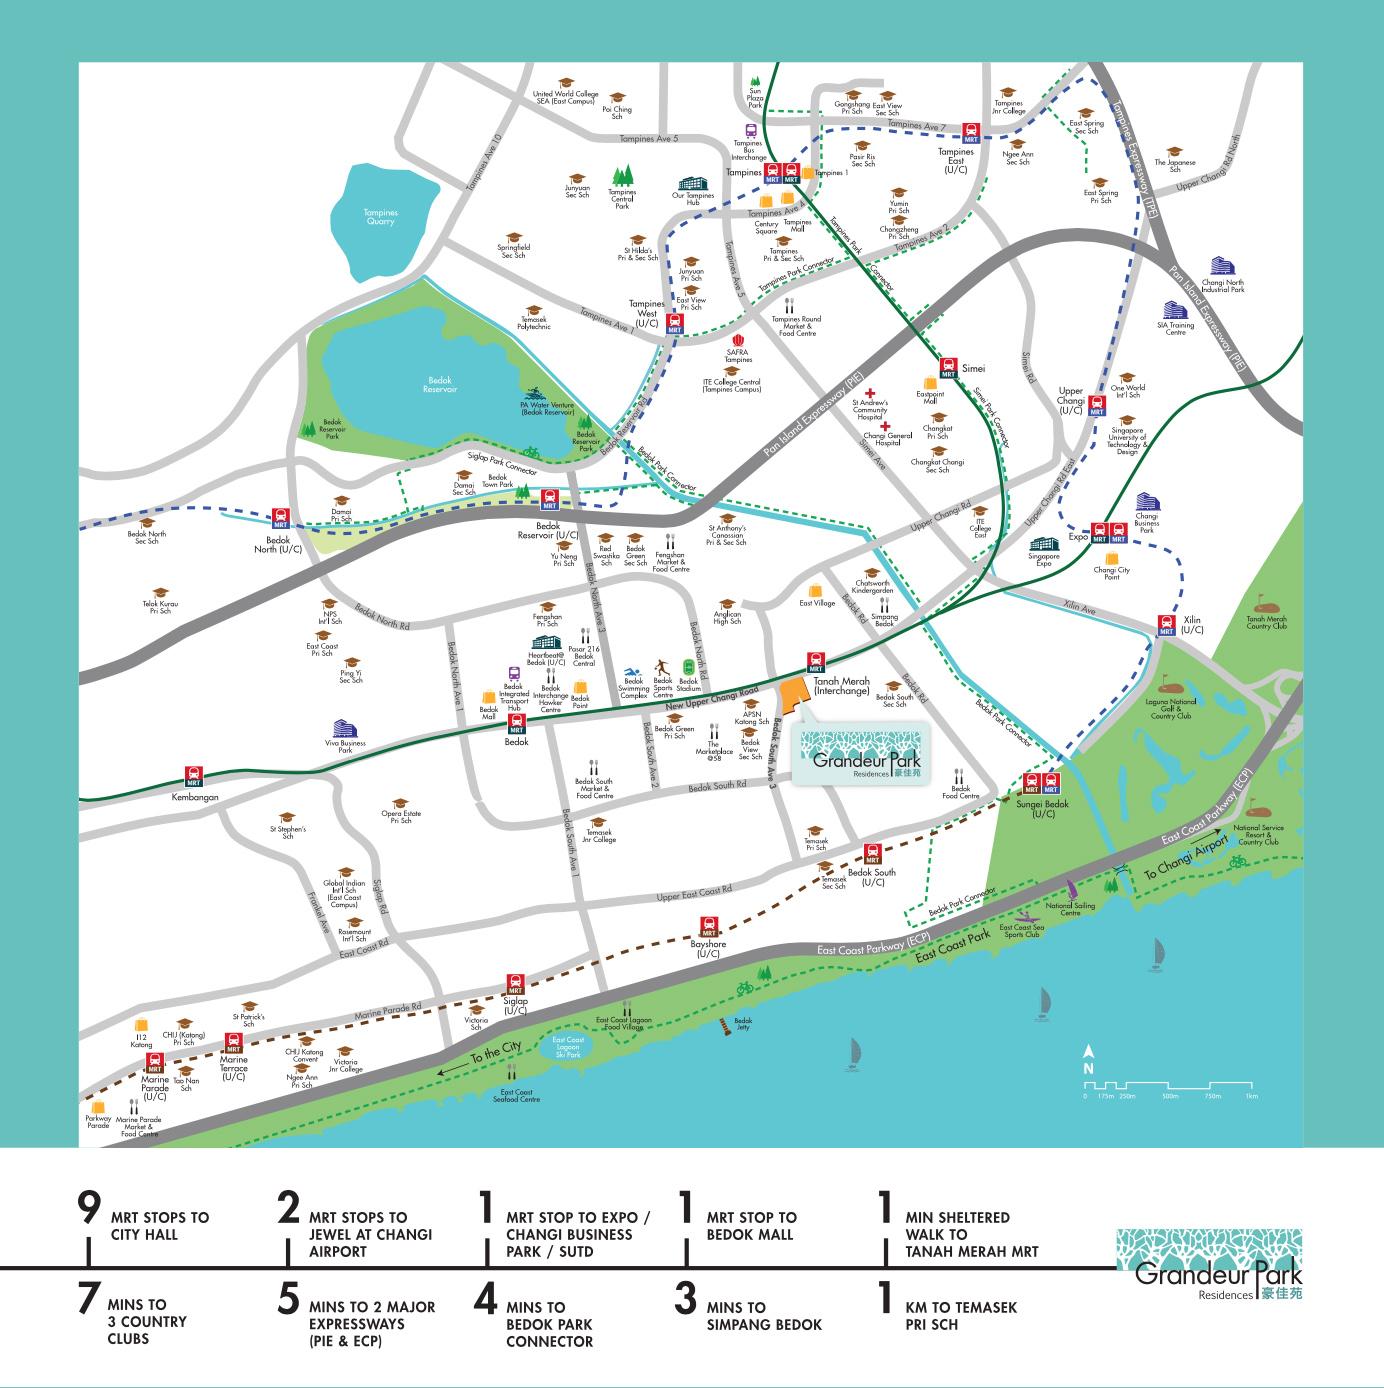 Grandeur-Park-Residences-location-map